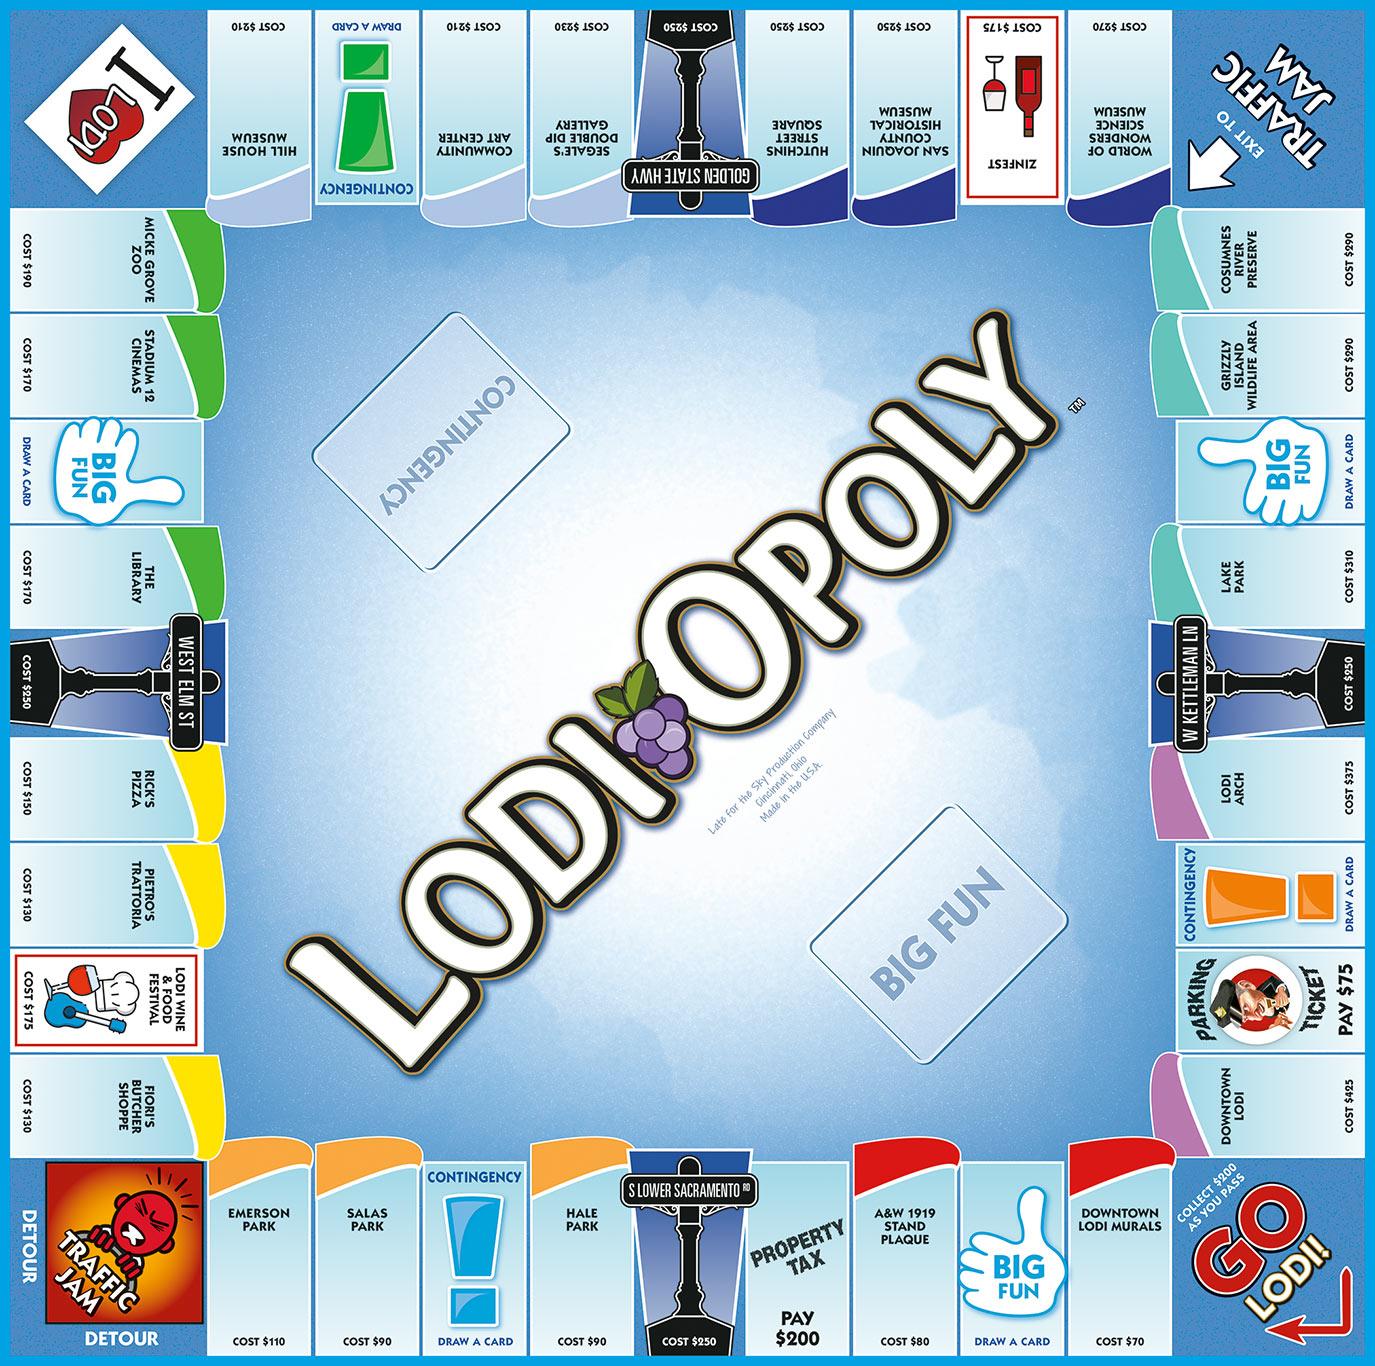 LODI-OPOLY Board Game